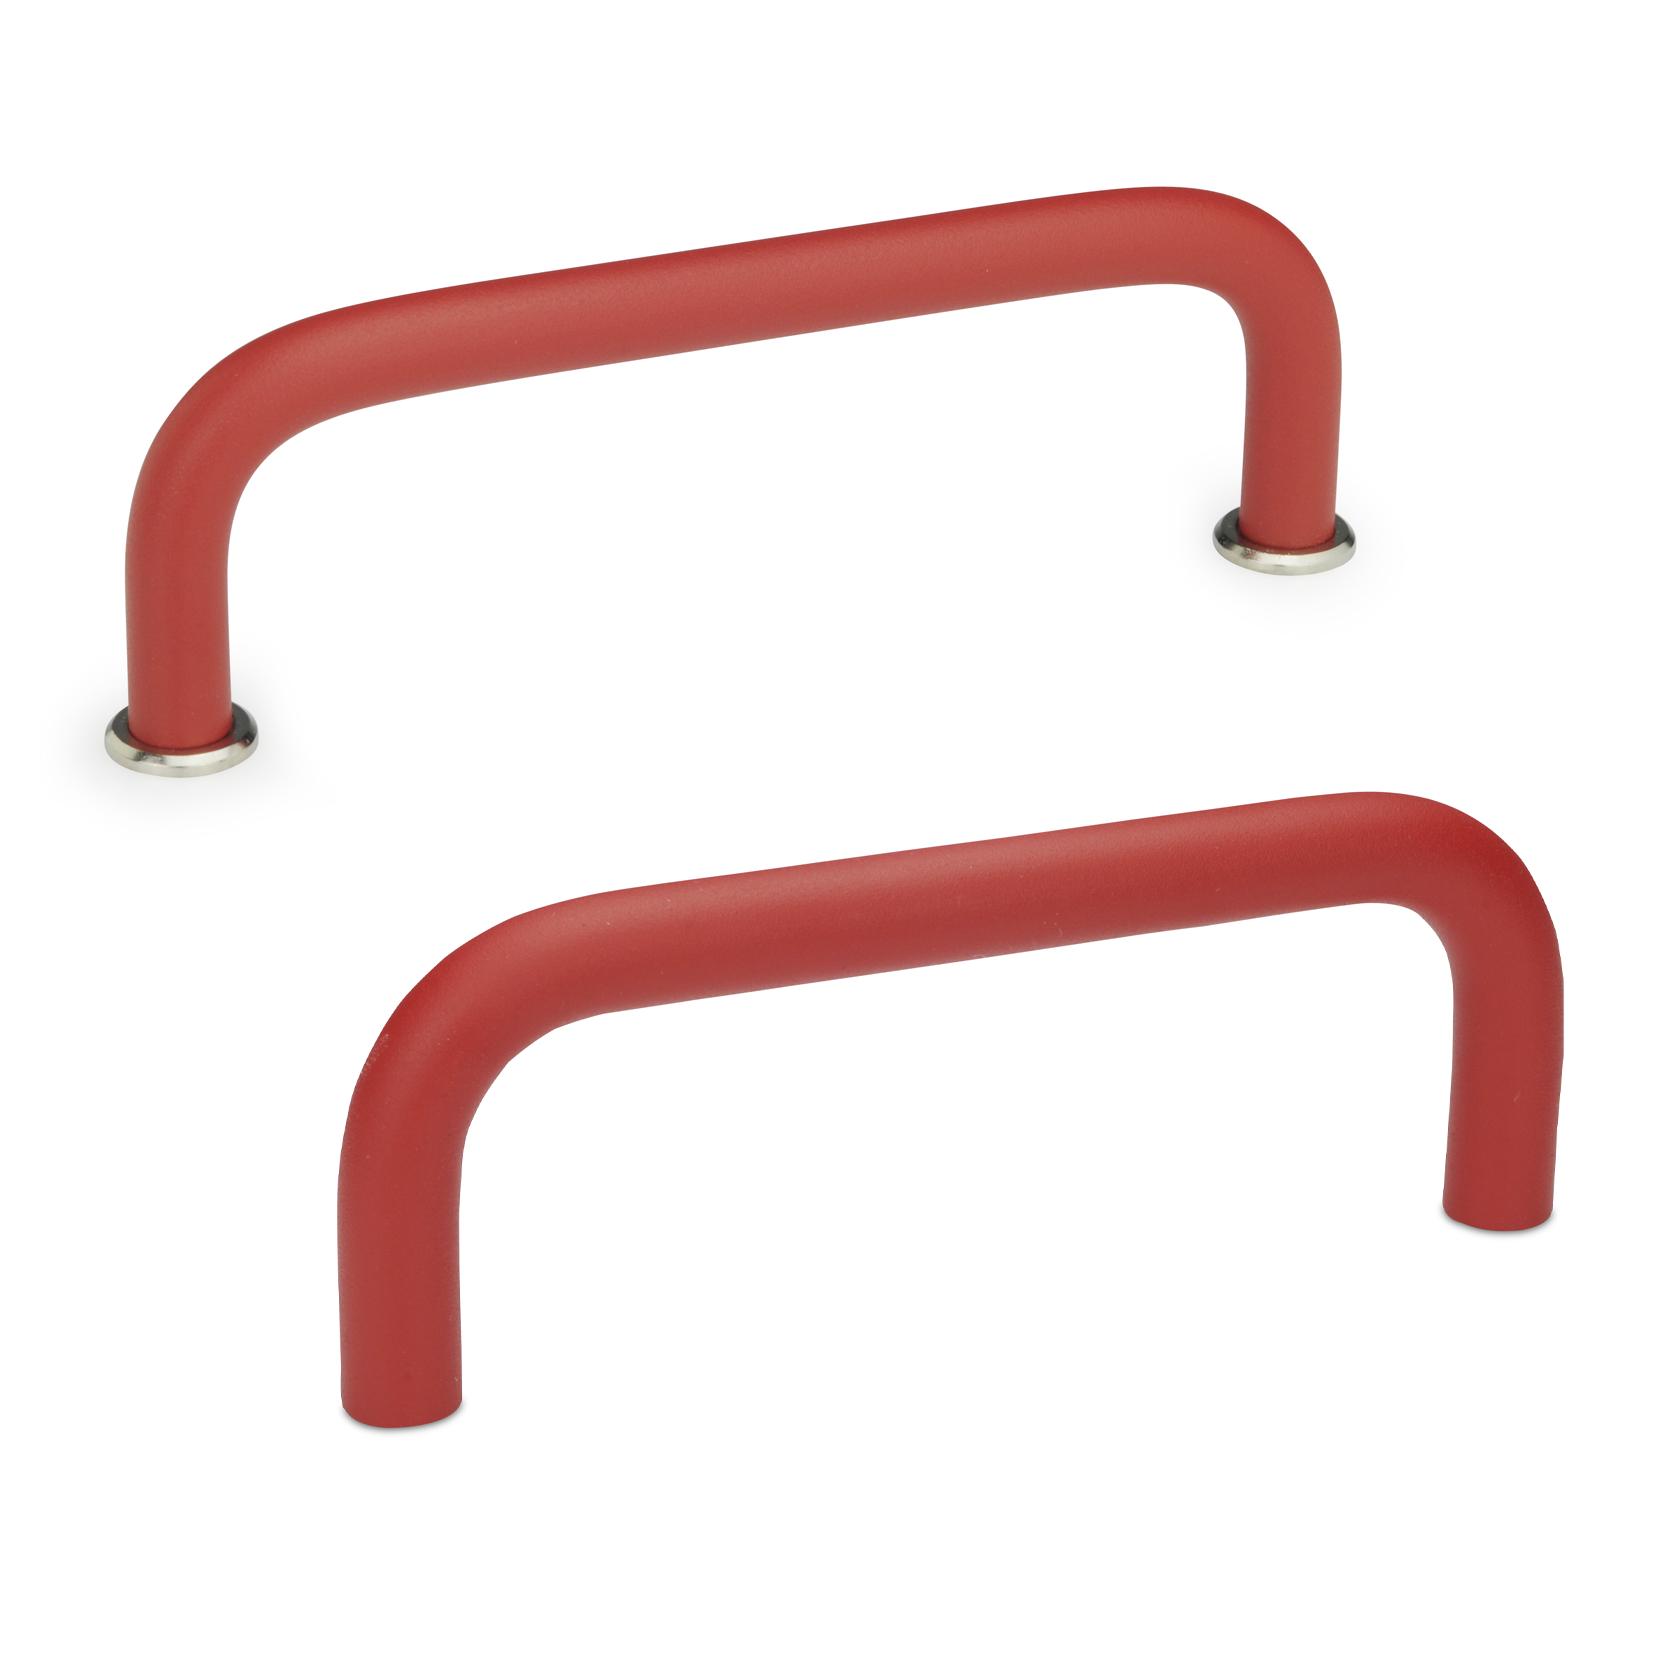 Bügelgriff 425, rund, Aluminium, rot